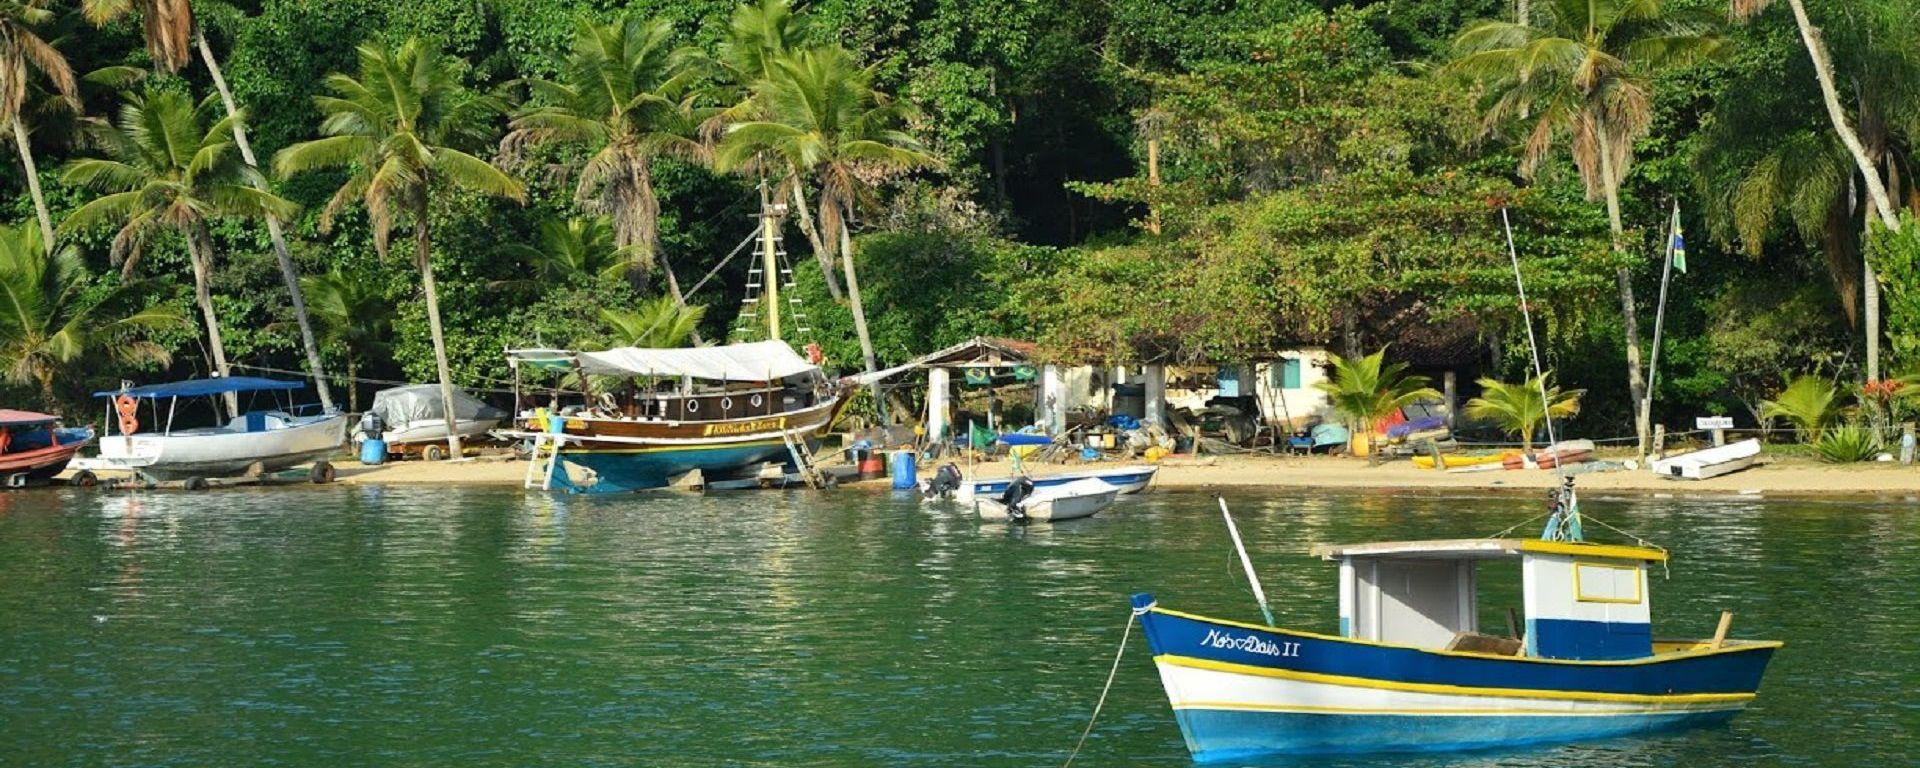 costa-verde-paraty-brazil